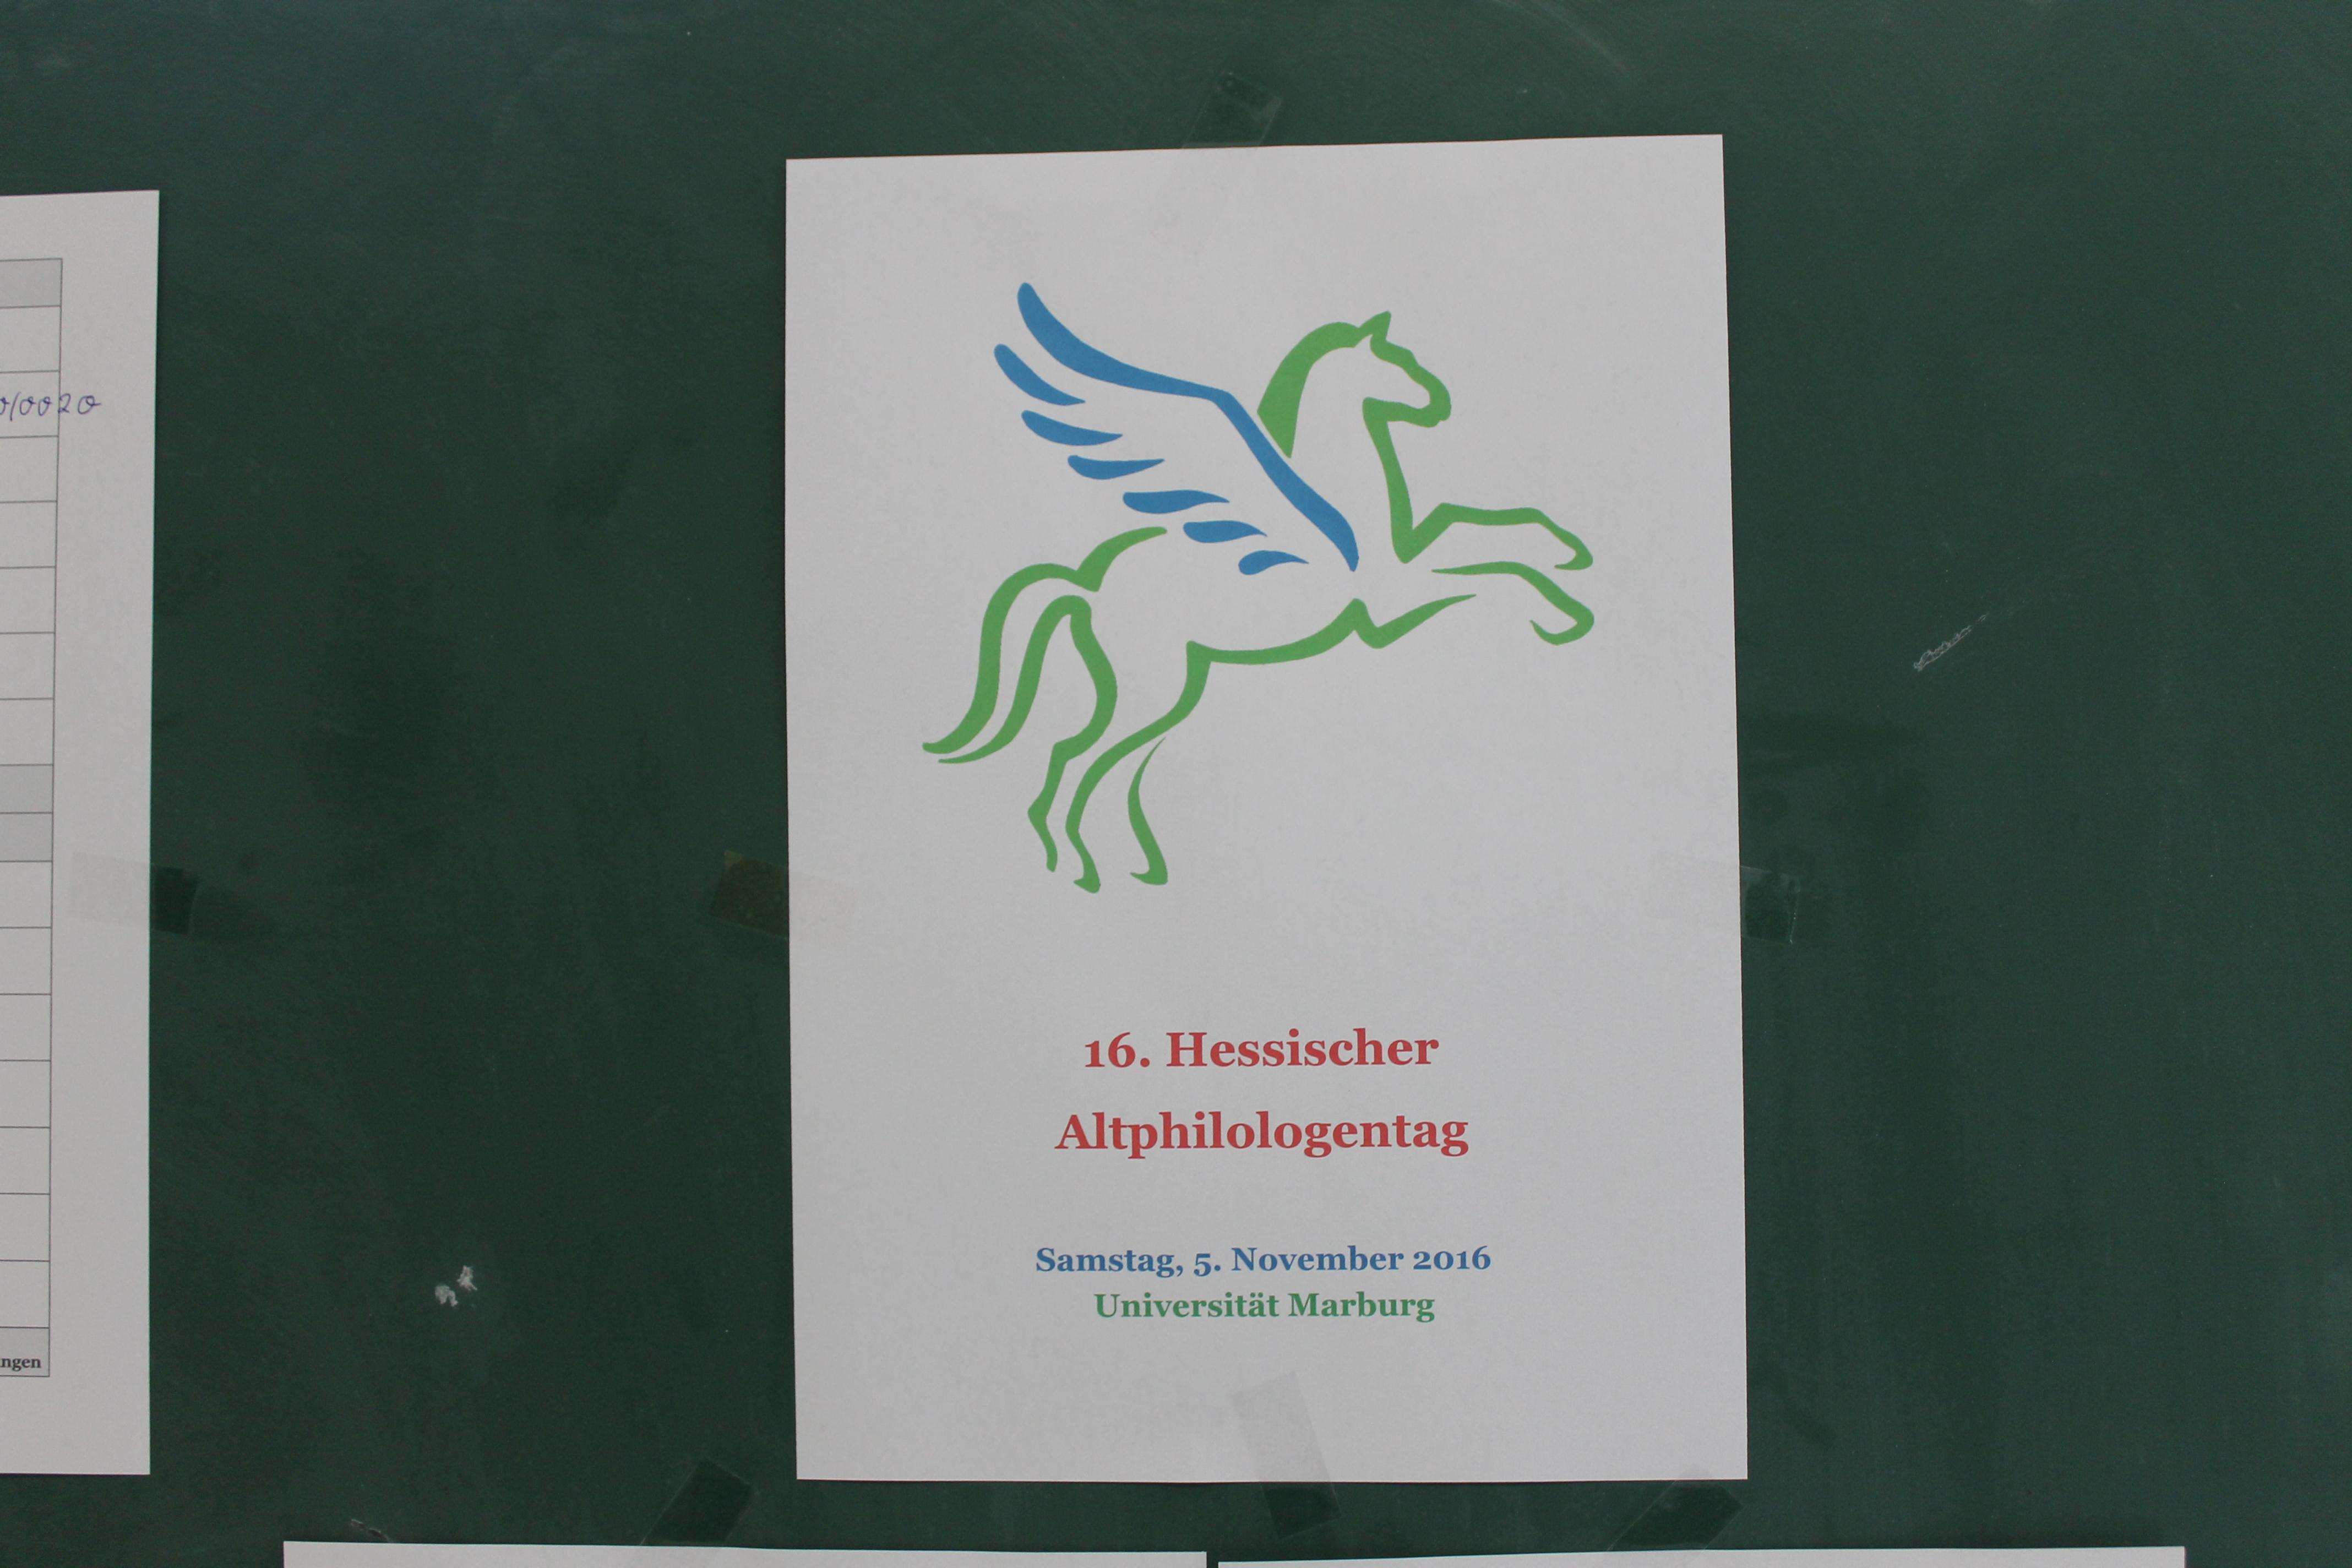 Altphilologenverband